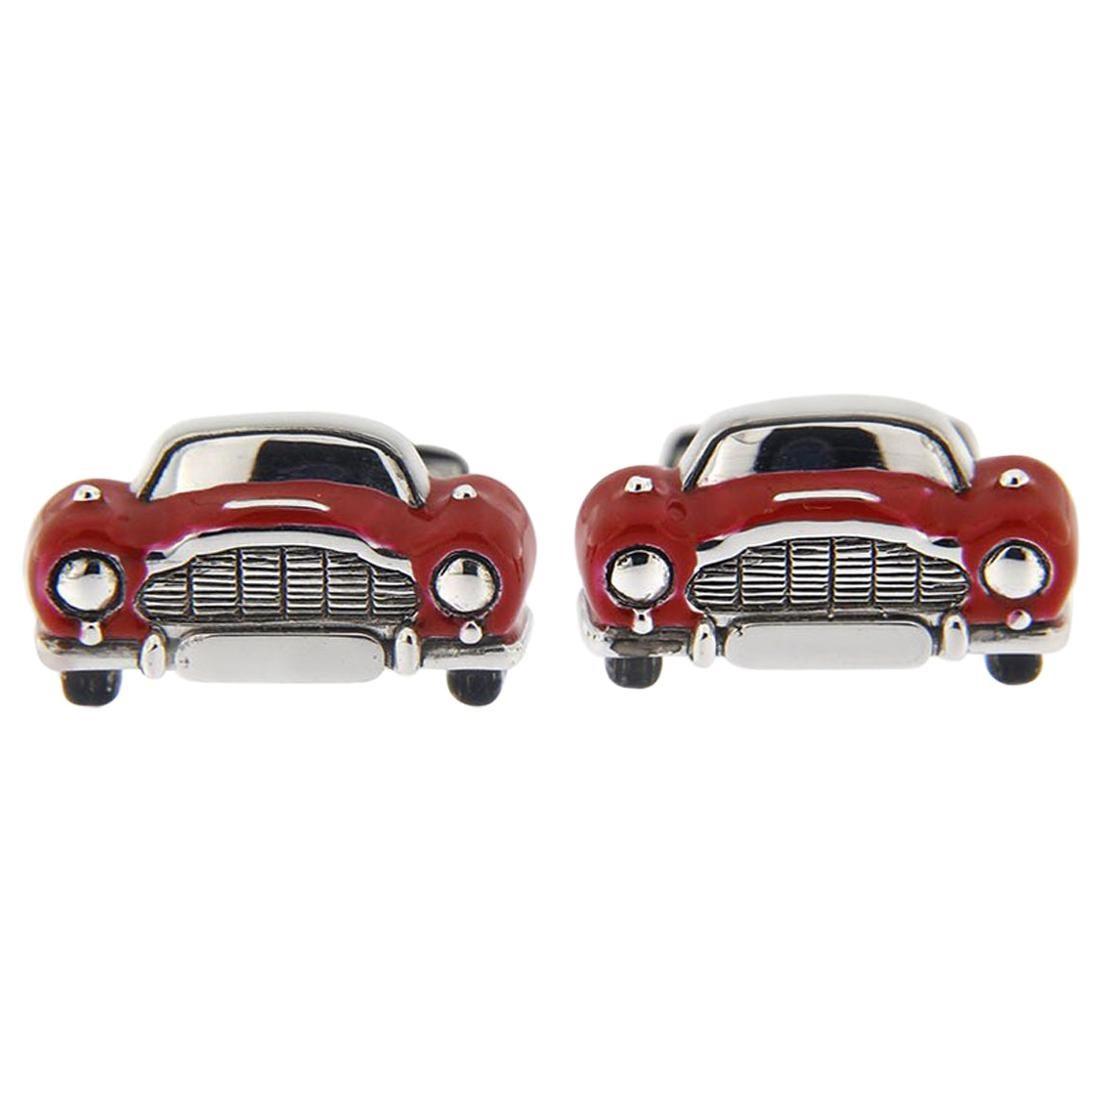 Alex Jona Sterling Silver Red Enamel Classic Convertible Car Cufflinks